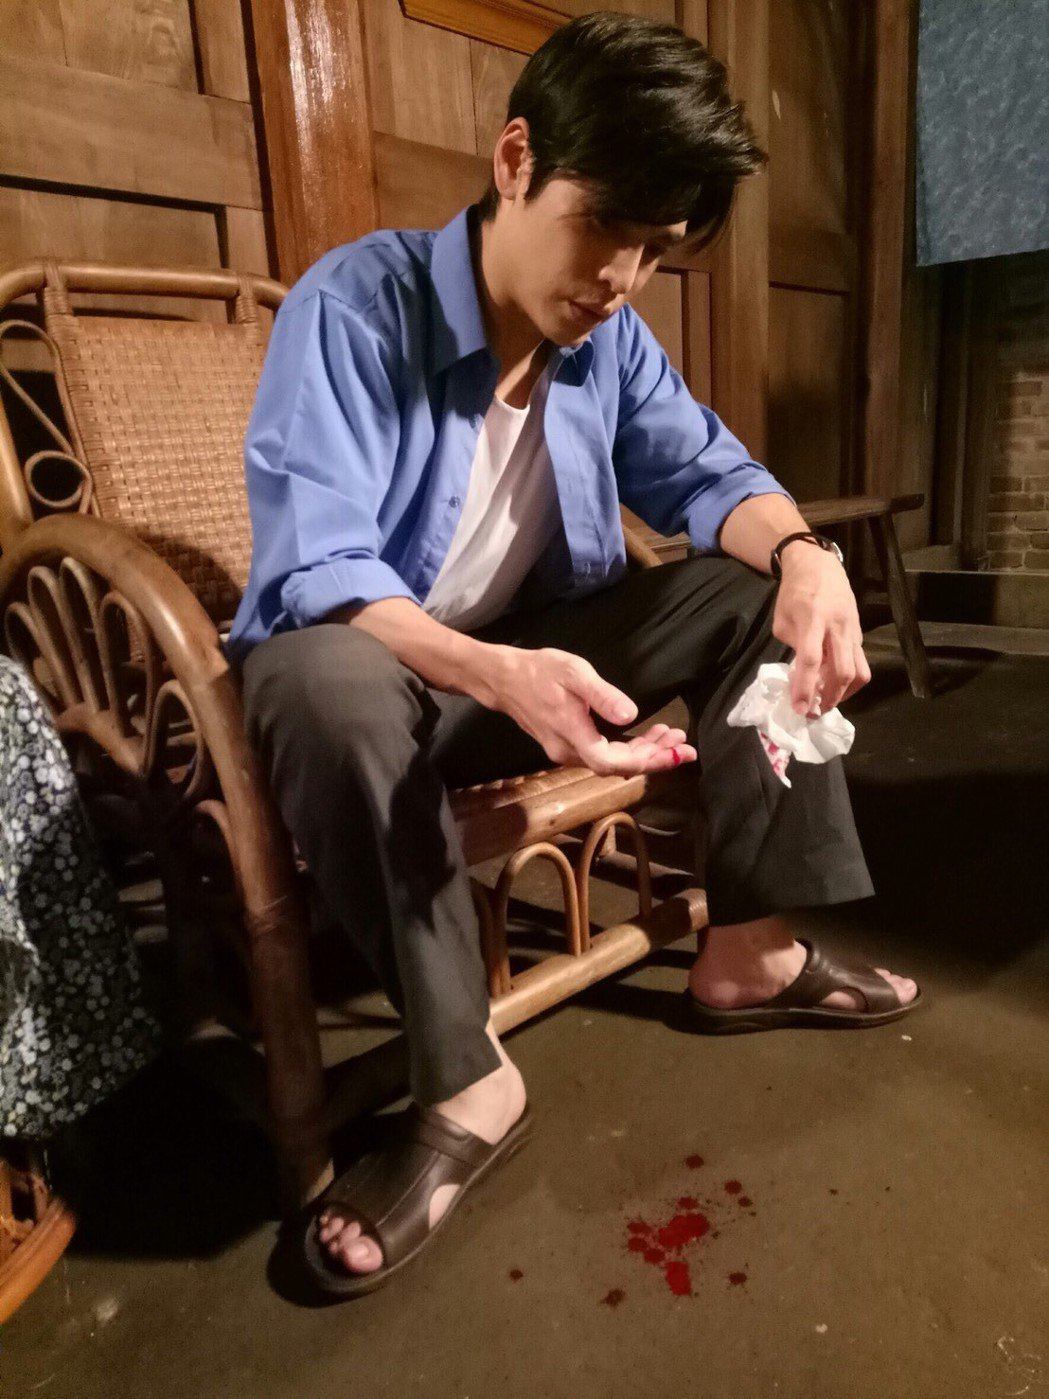 Gino演出8點檔新戲「大時代」突遭酒瓶割傷手指,當場血流如注。圖/民視提供